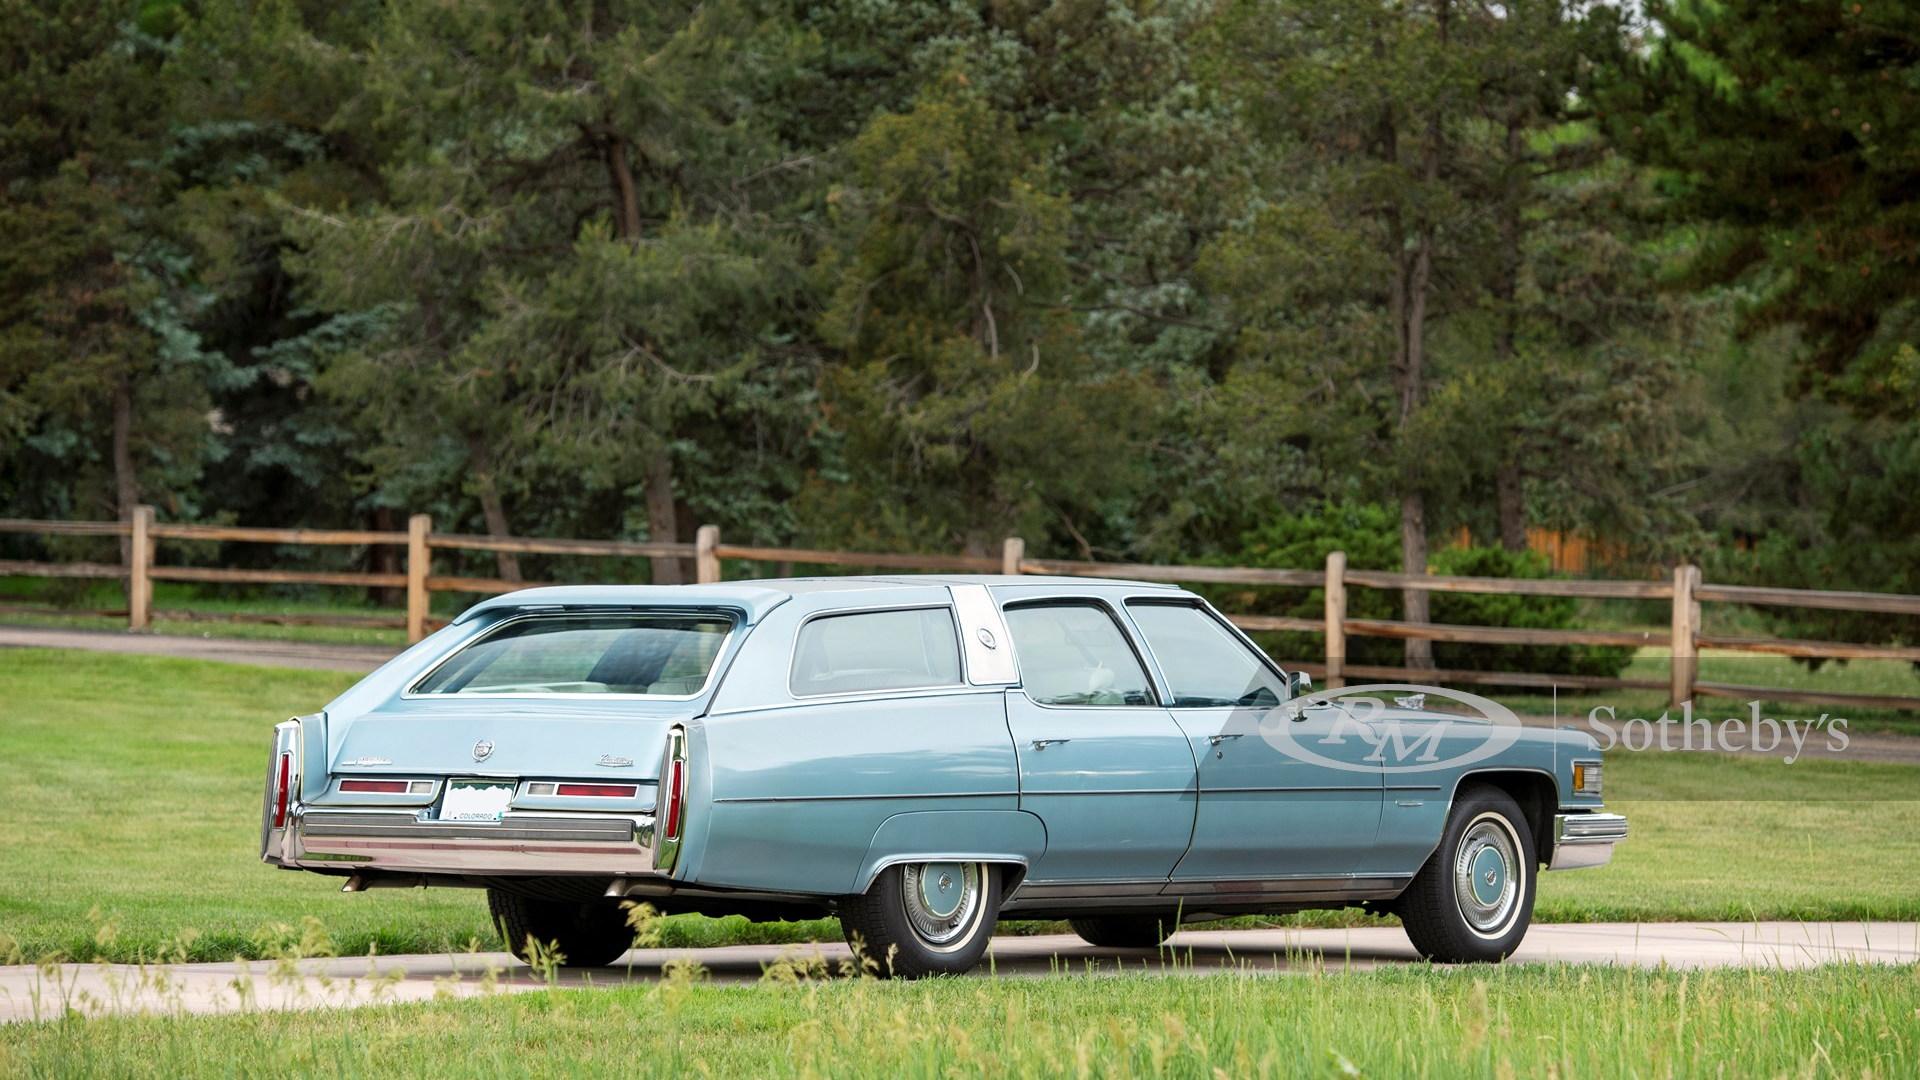 1976 Cadillac Castillian Fleetwood Estate Wagon (photo by RM Sotheby's)